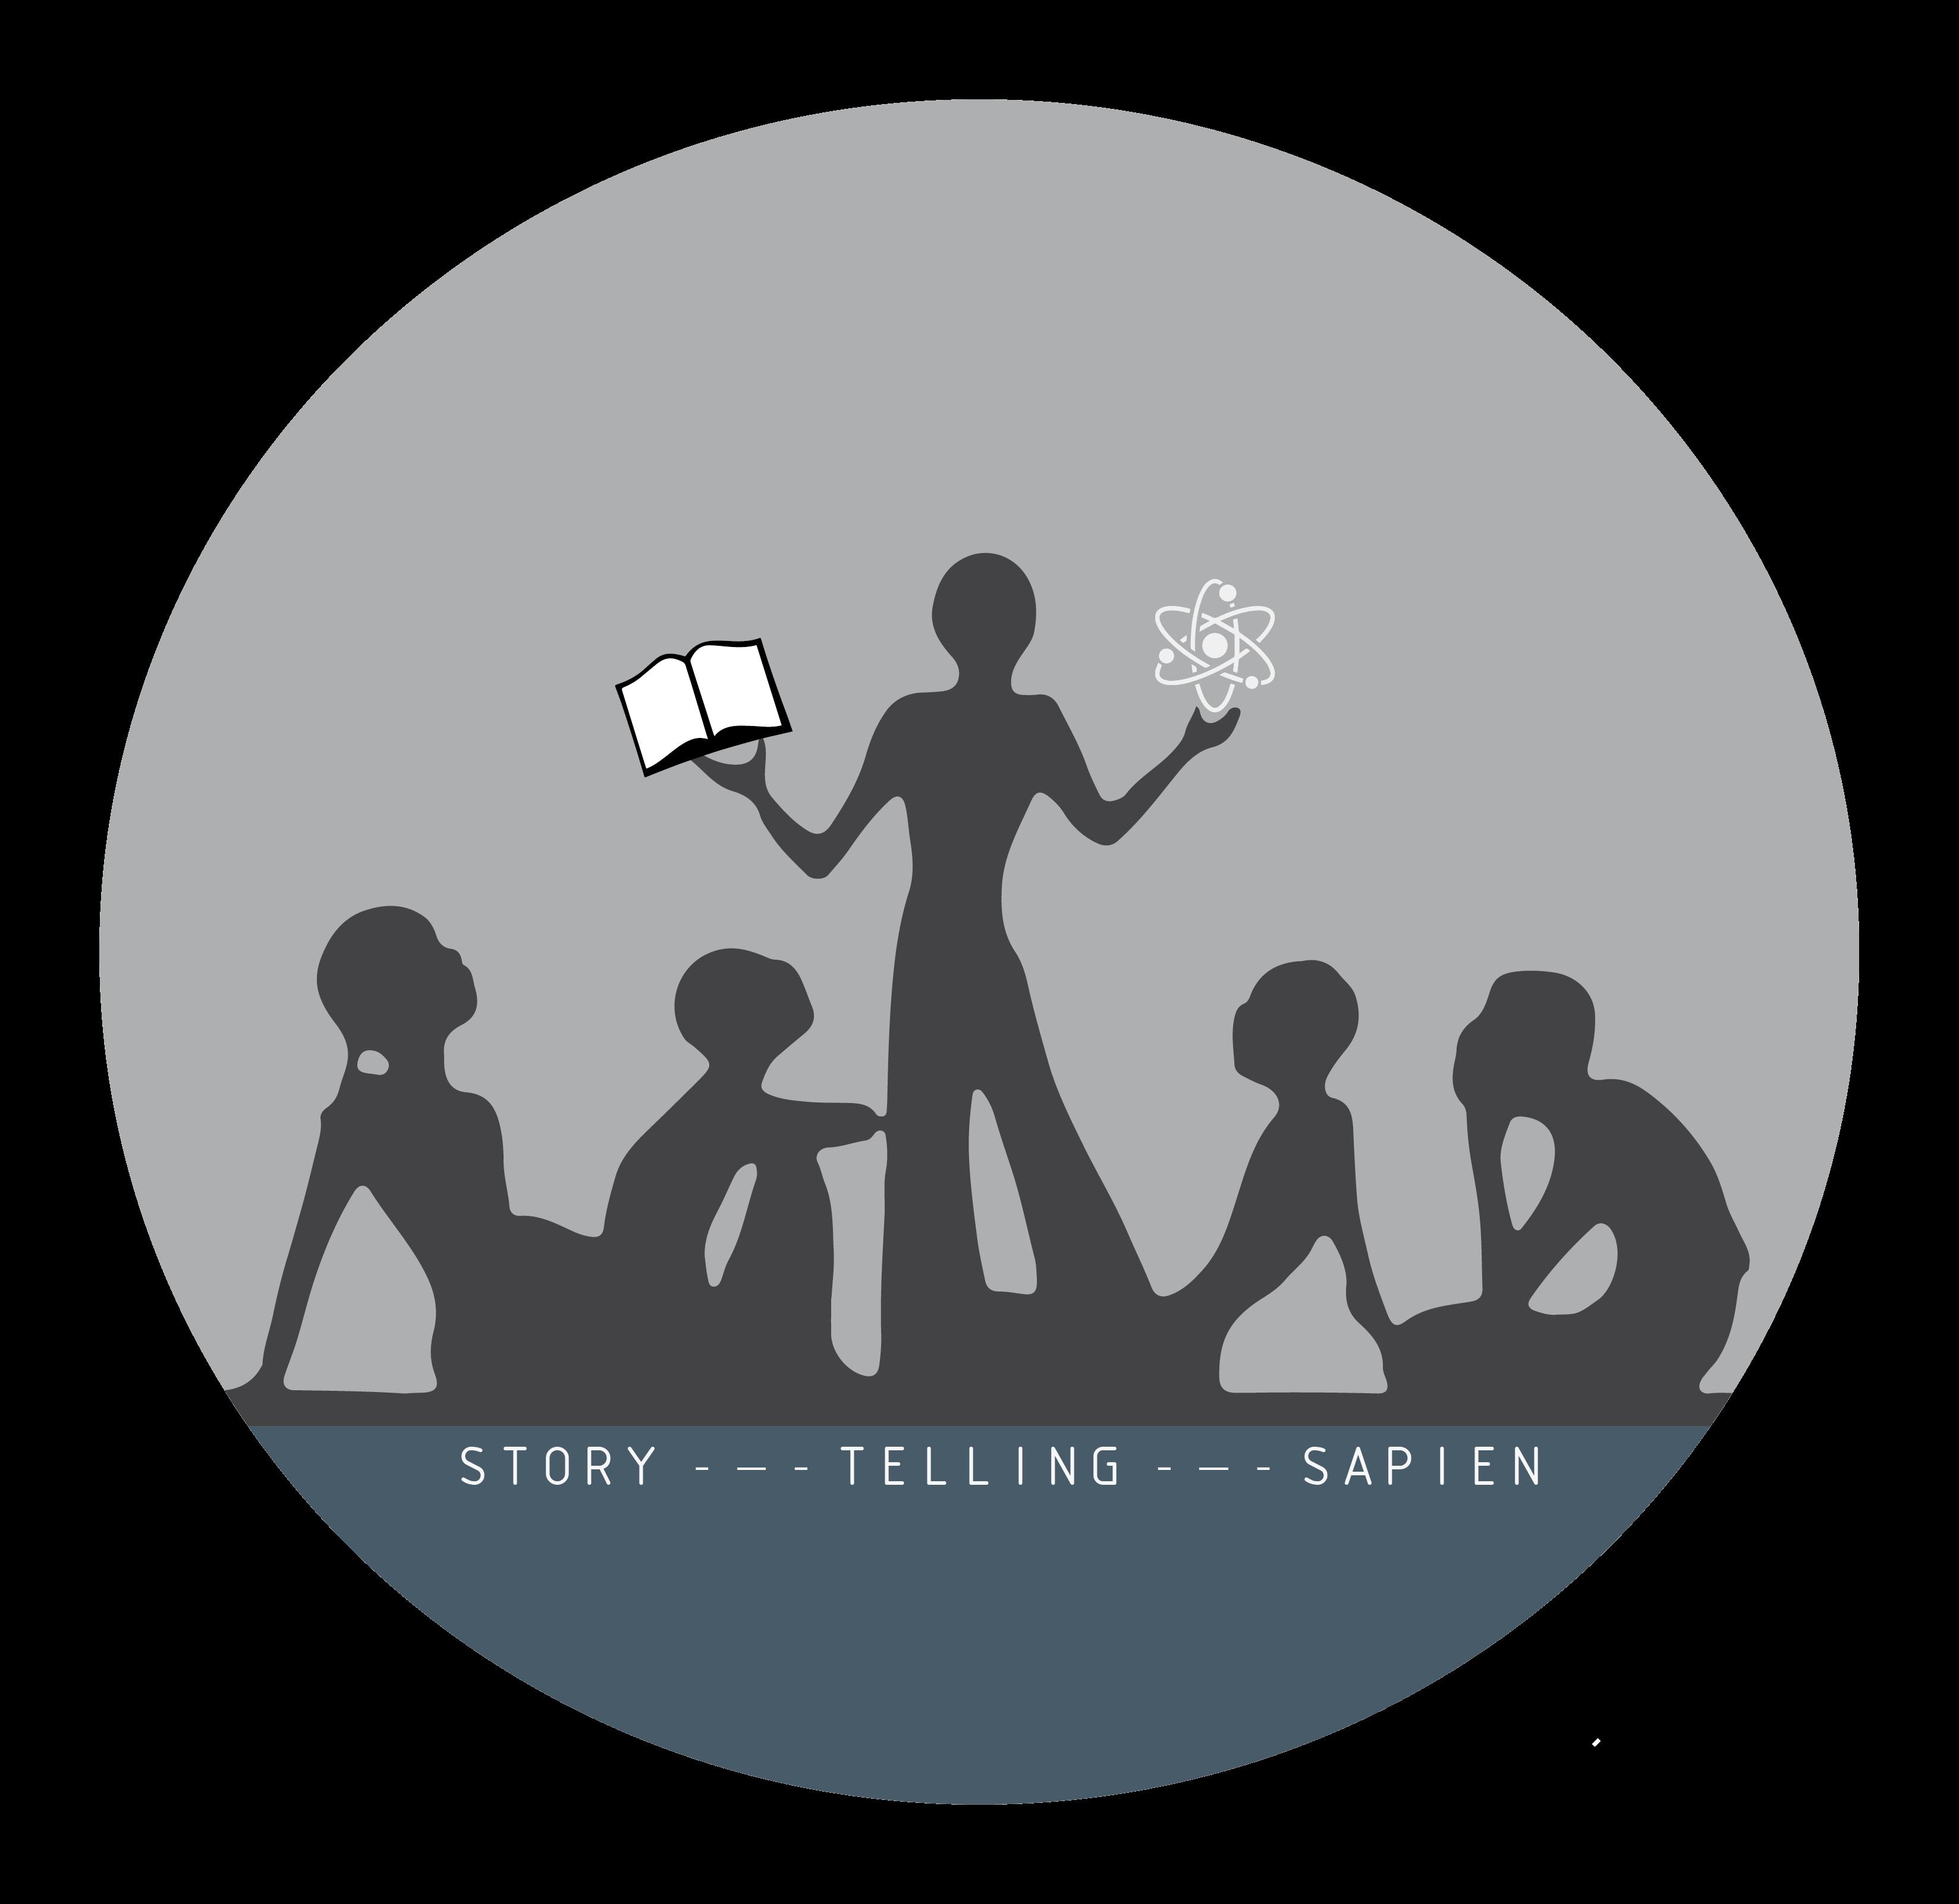 Storytelling Sapien